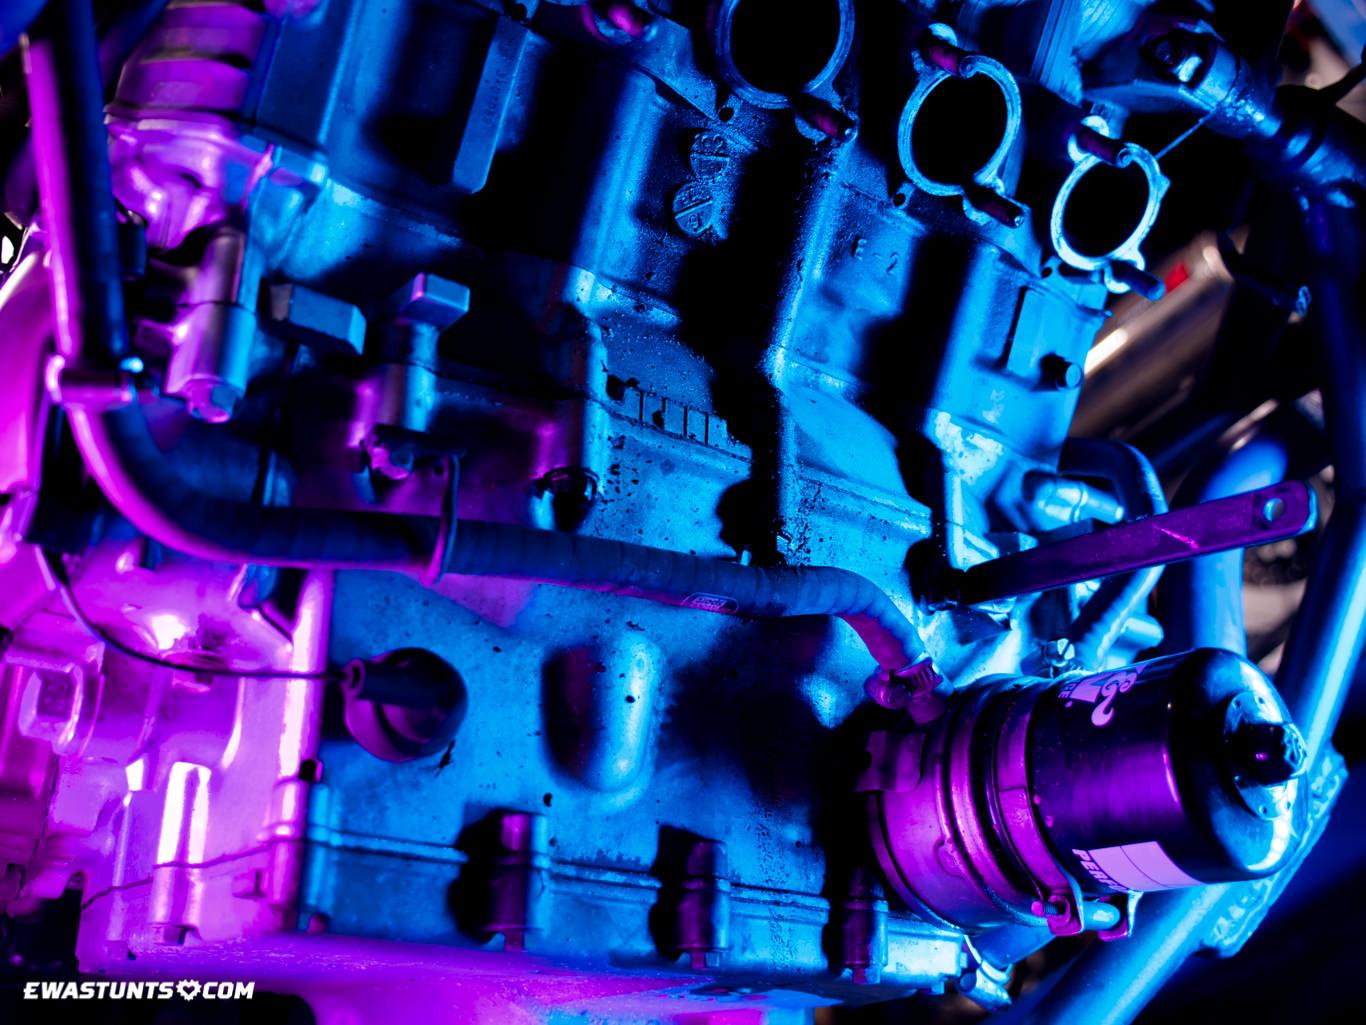 ewastunts_engine_wrapping_1